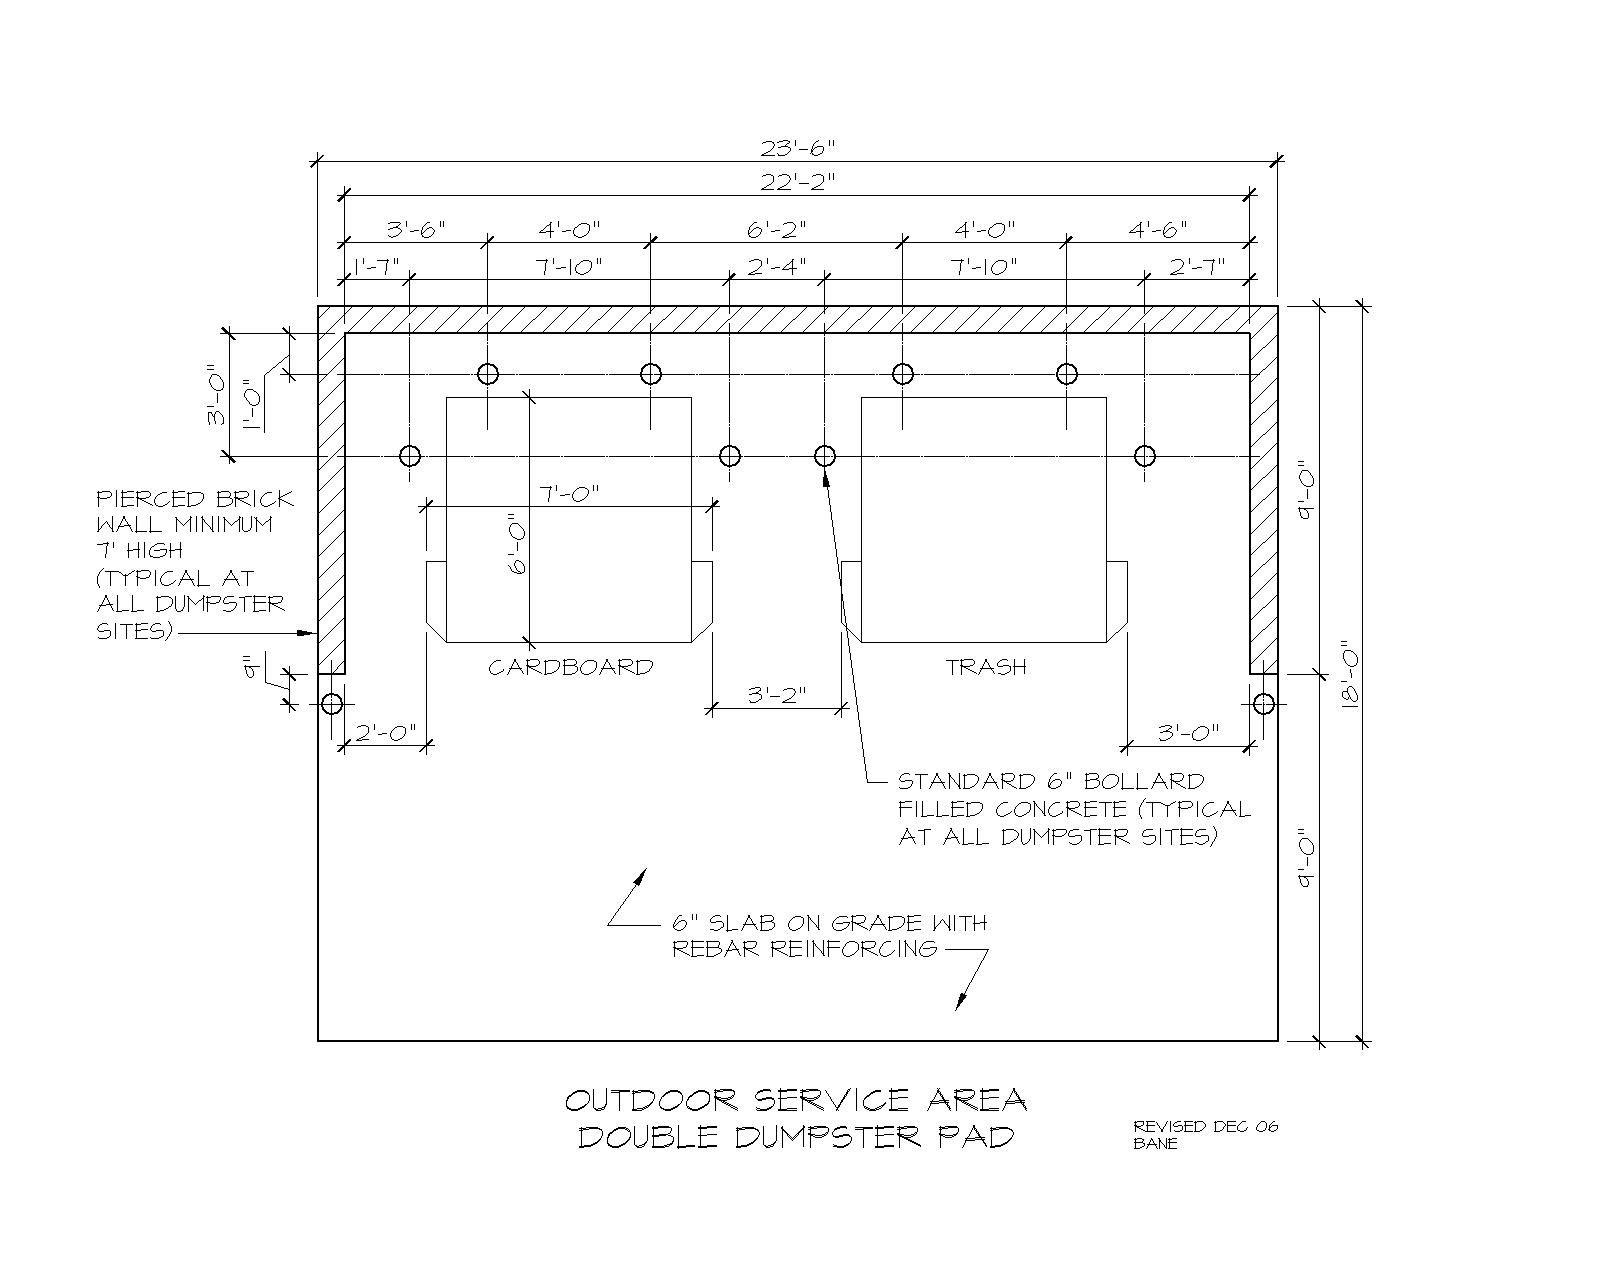 Dumpster Enclosure Dimensions Google Search Dumpster Design Brick Wall